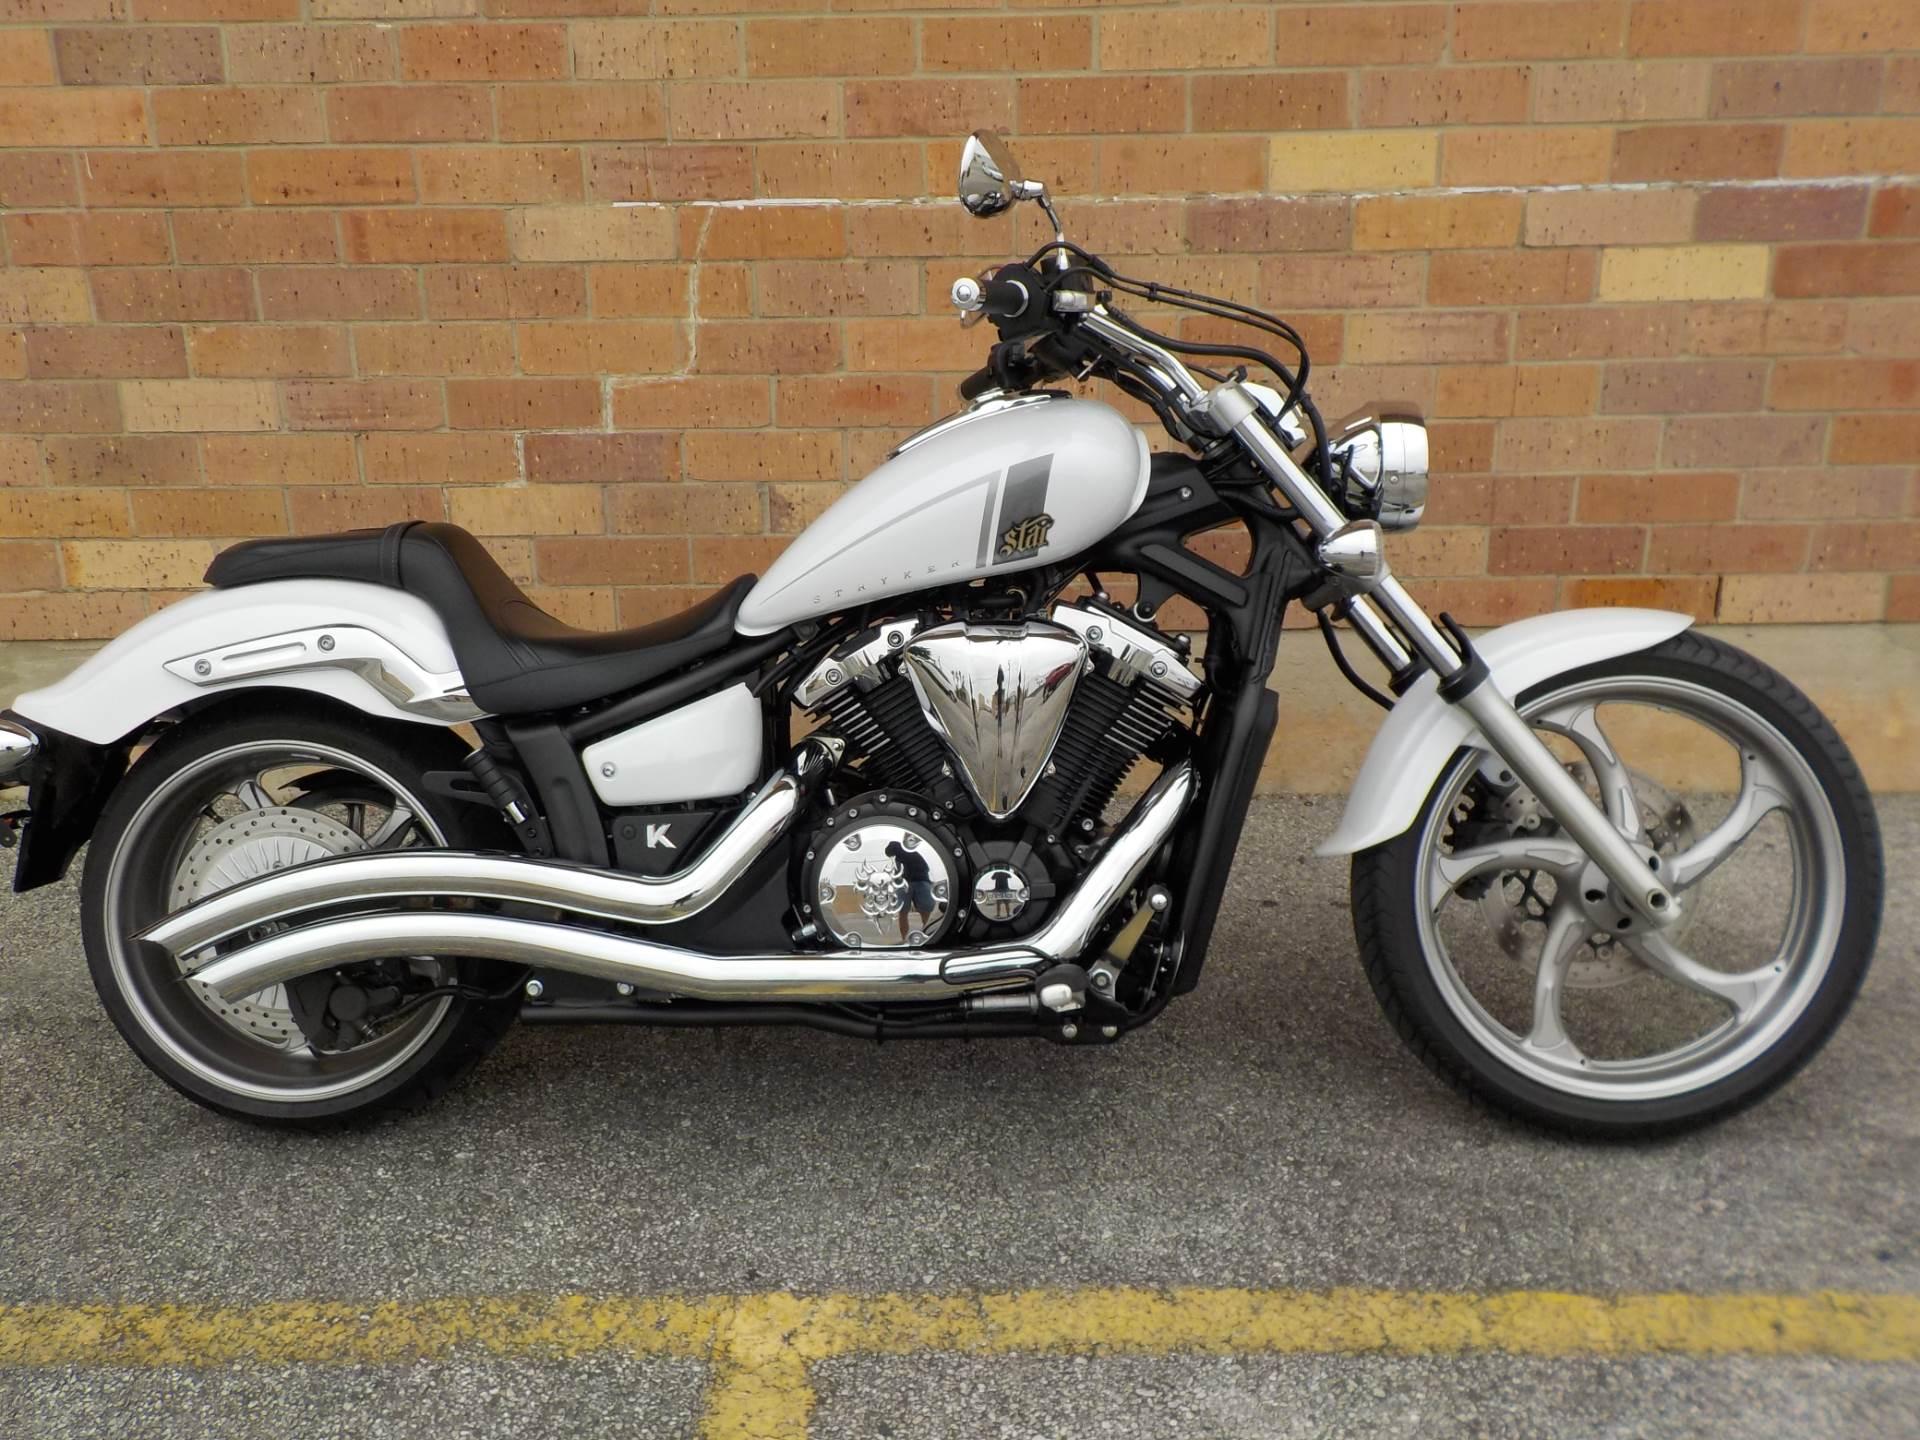 2013 Yamaha Stryker for sale 7885